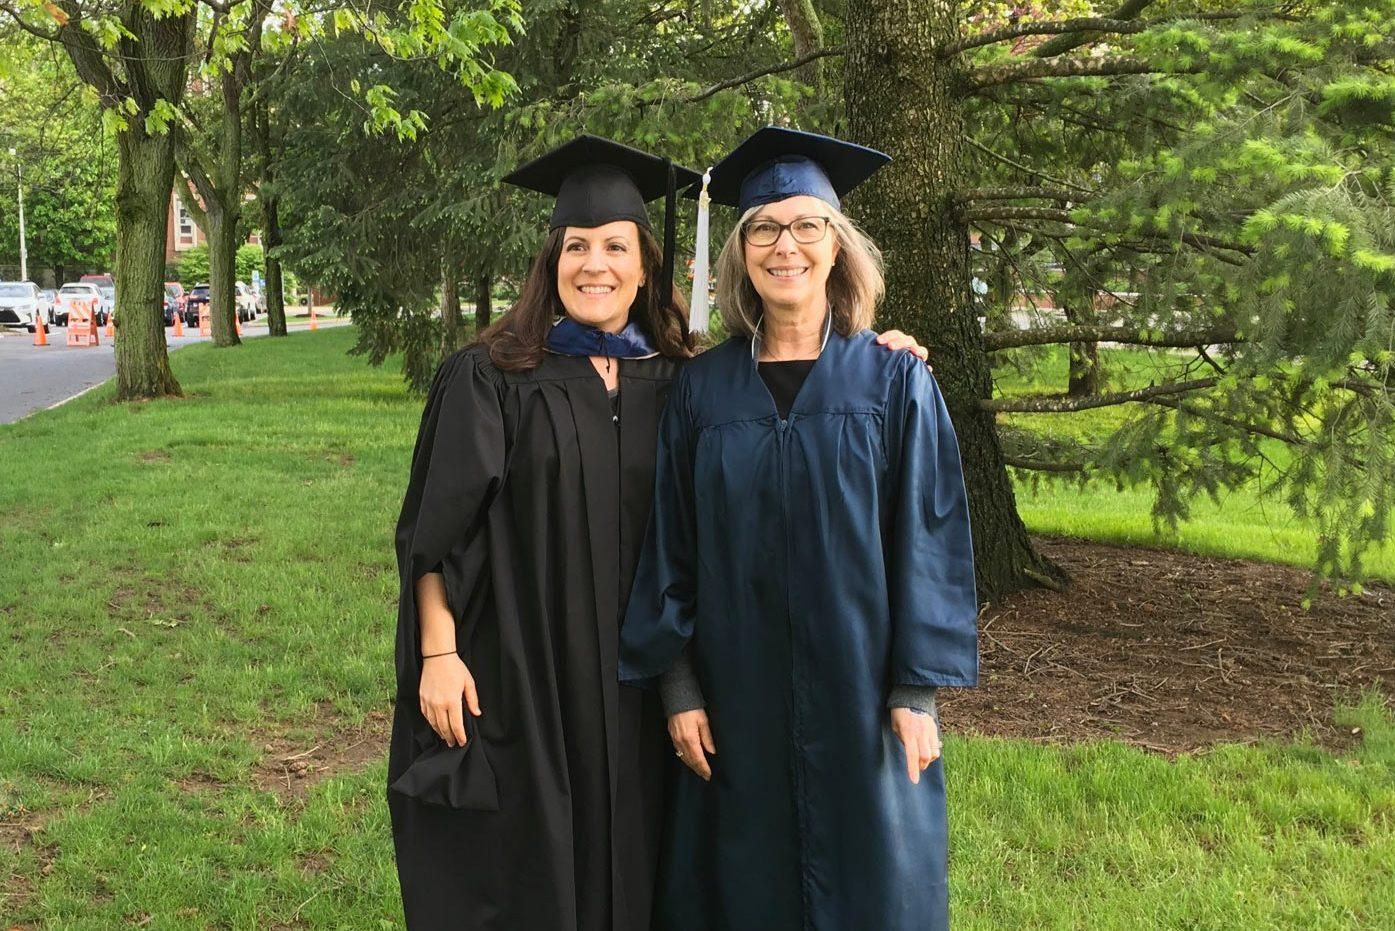 Christine Stallard and Haley Sankey